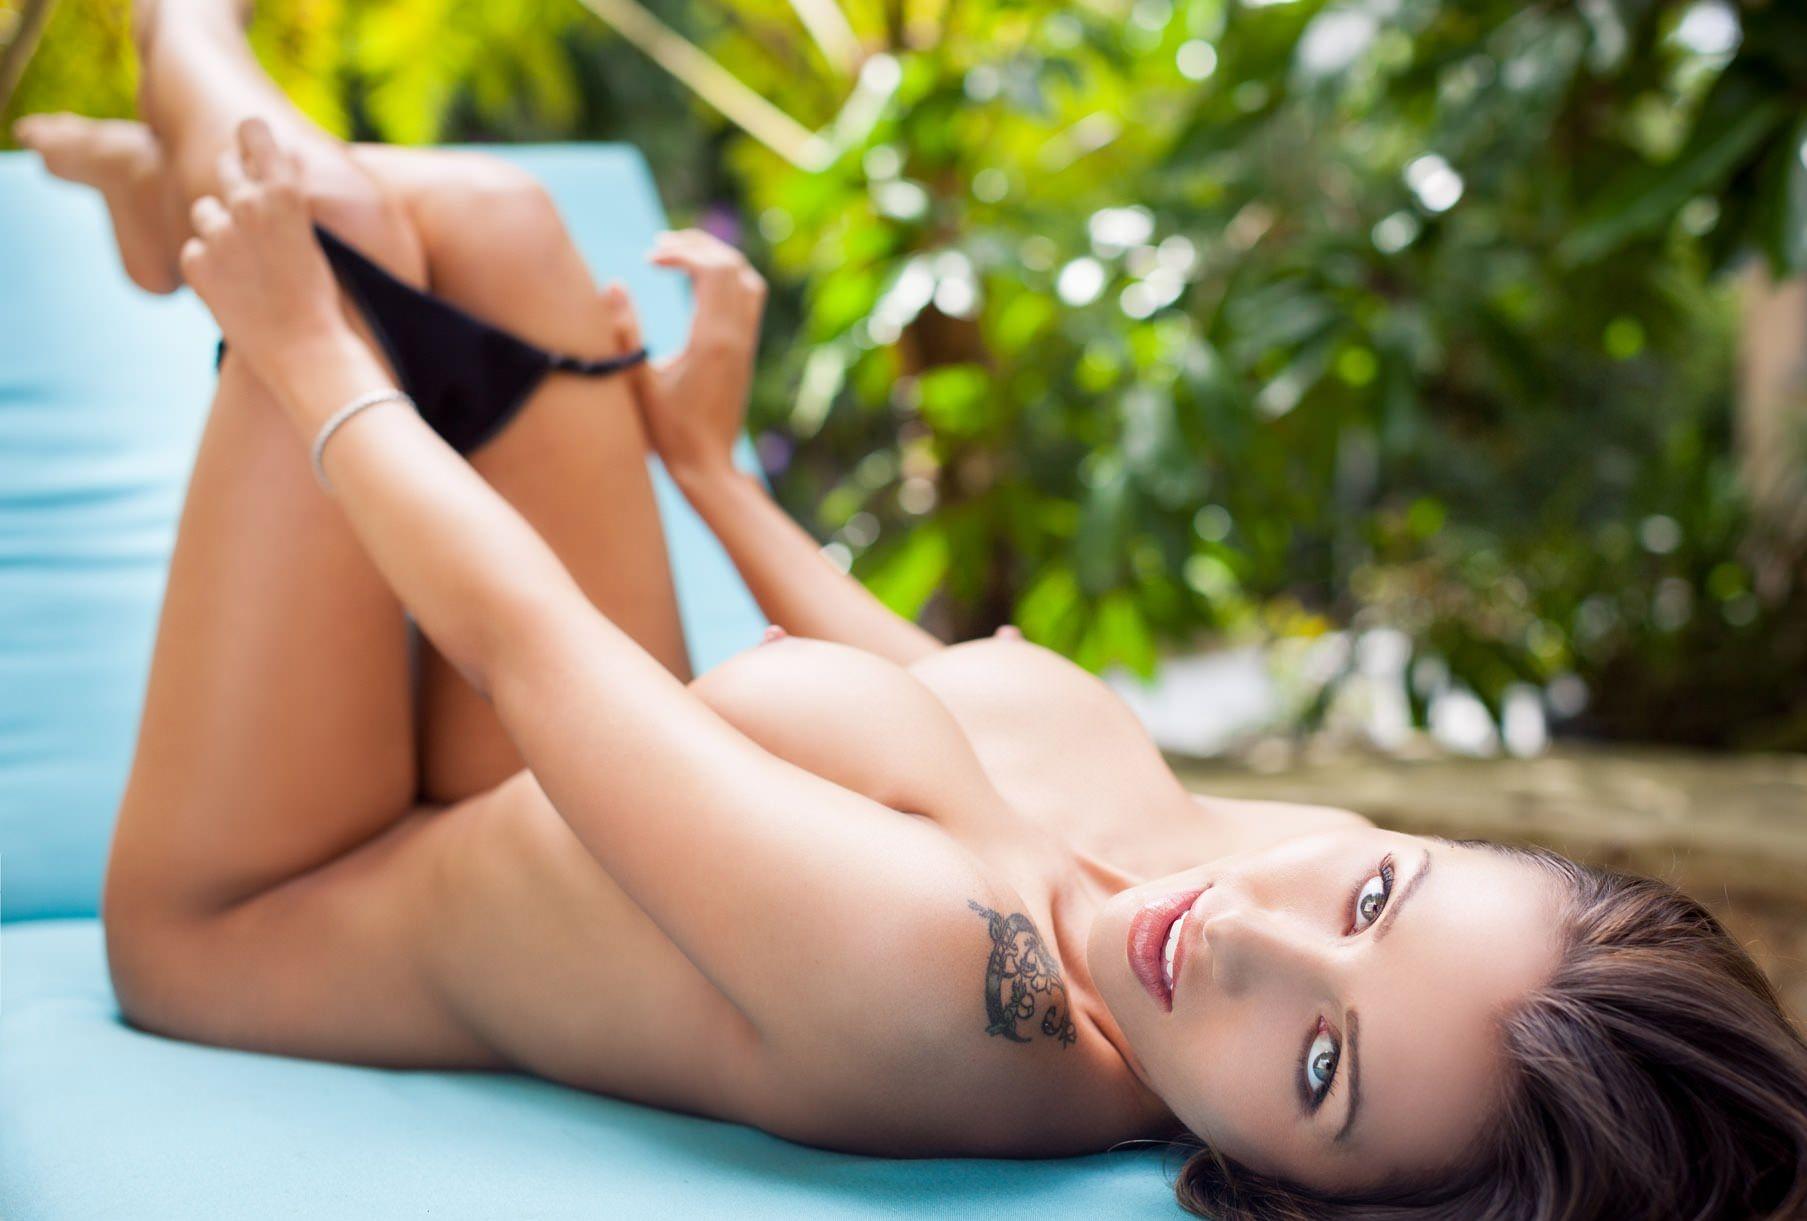 Casey osu nude